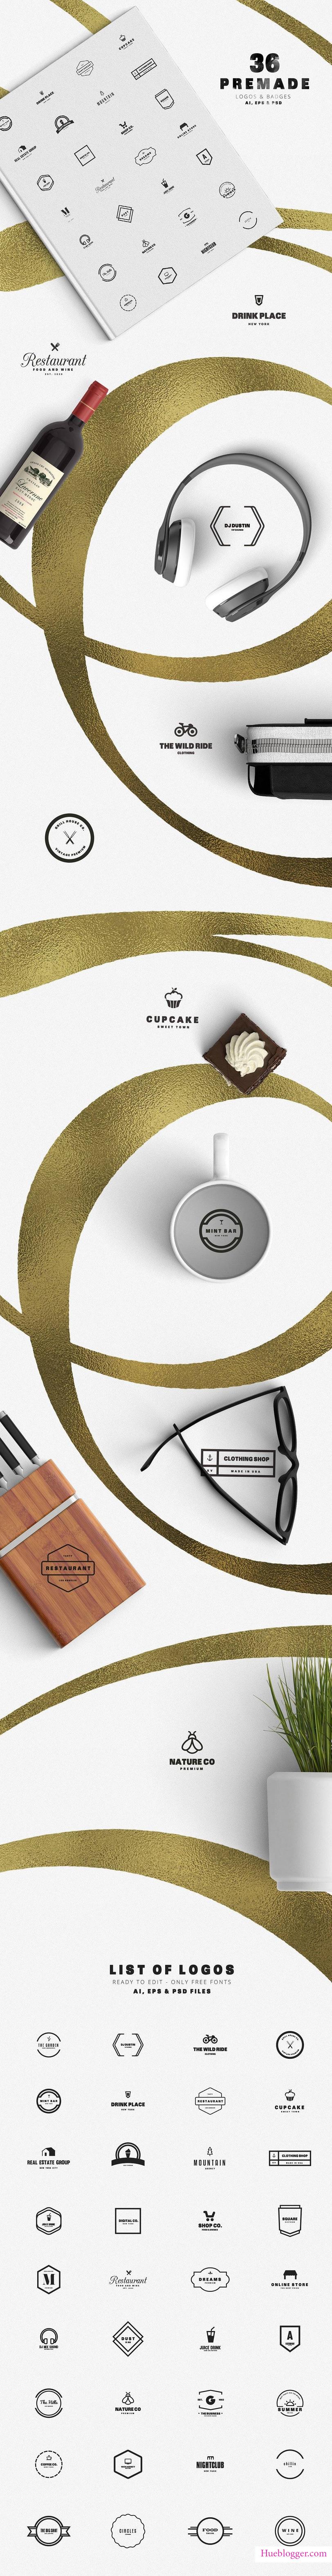 Bộ template thiết kế logo cho designer